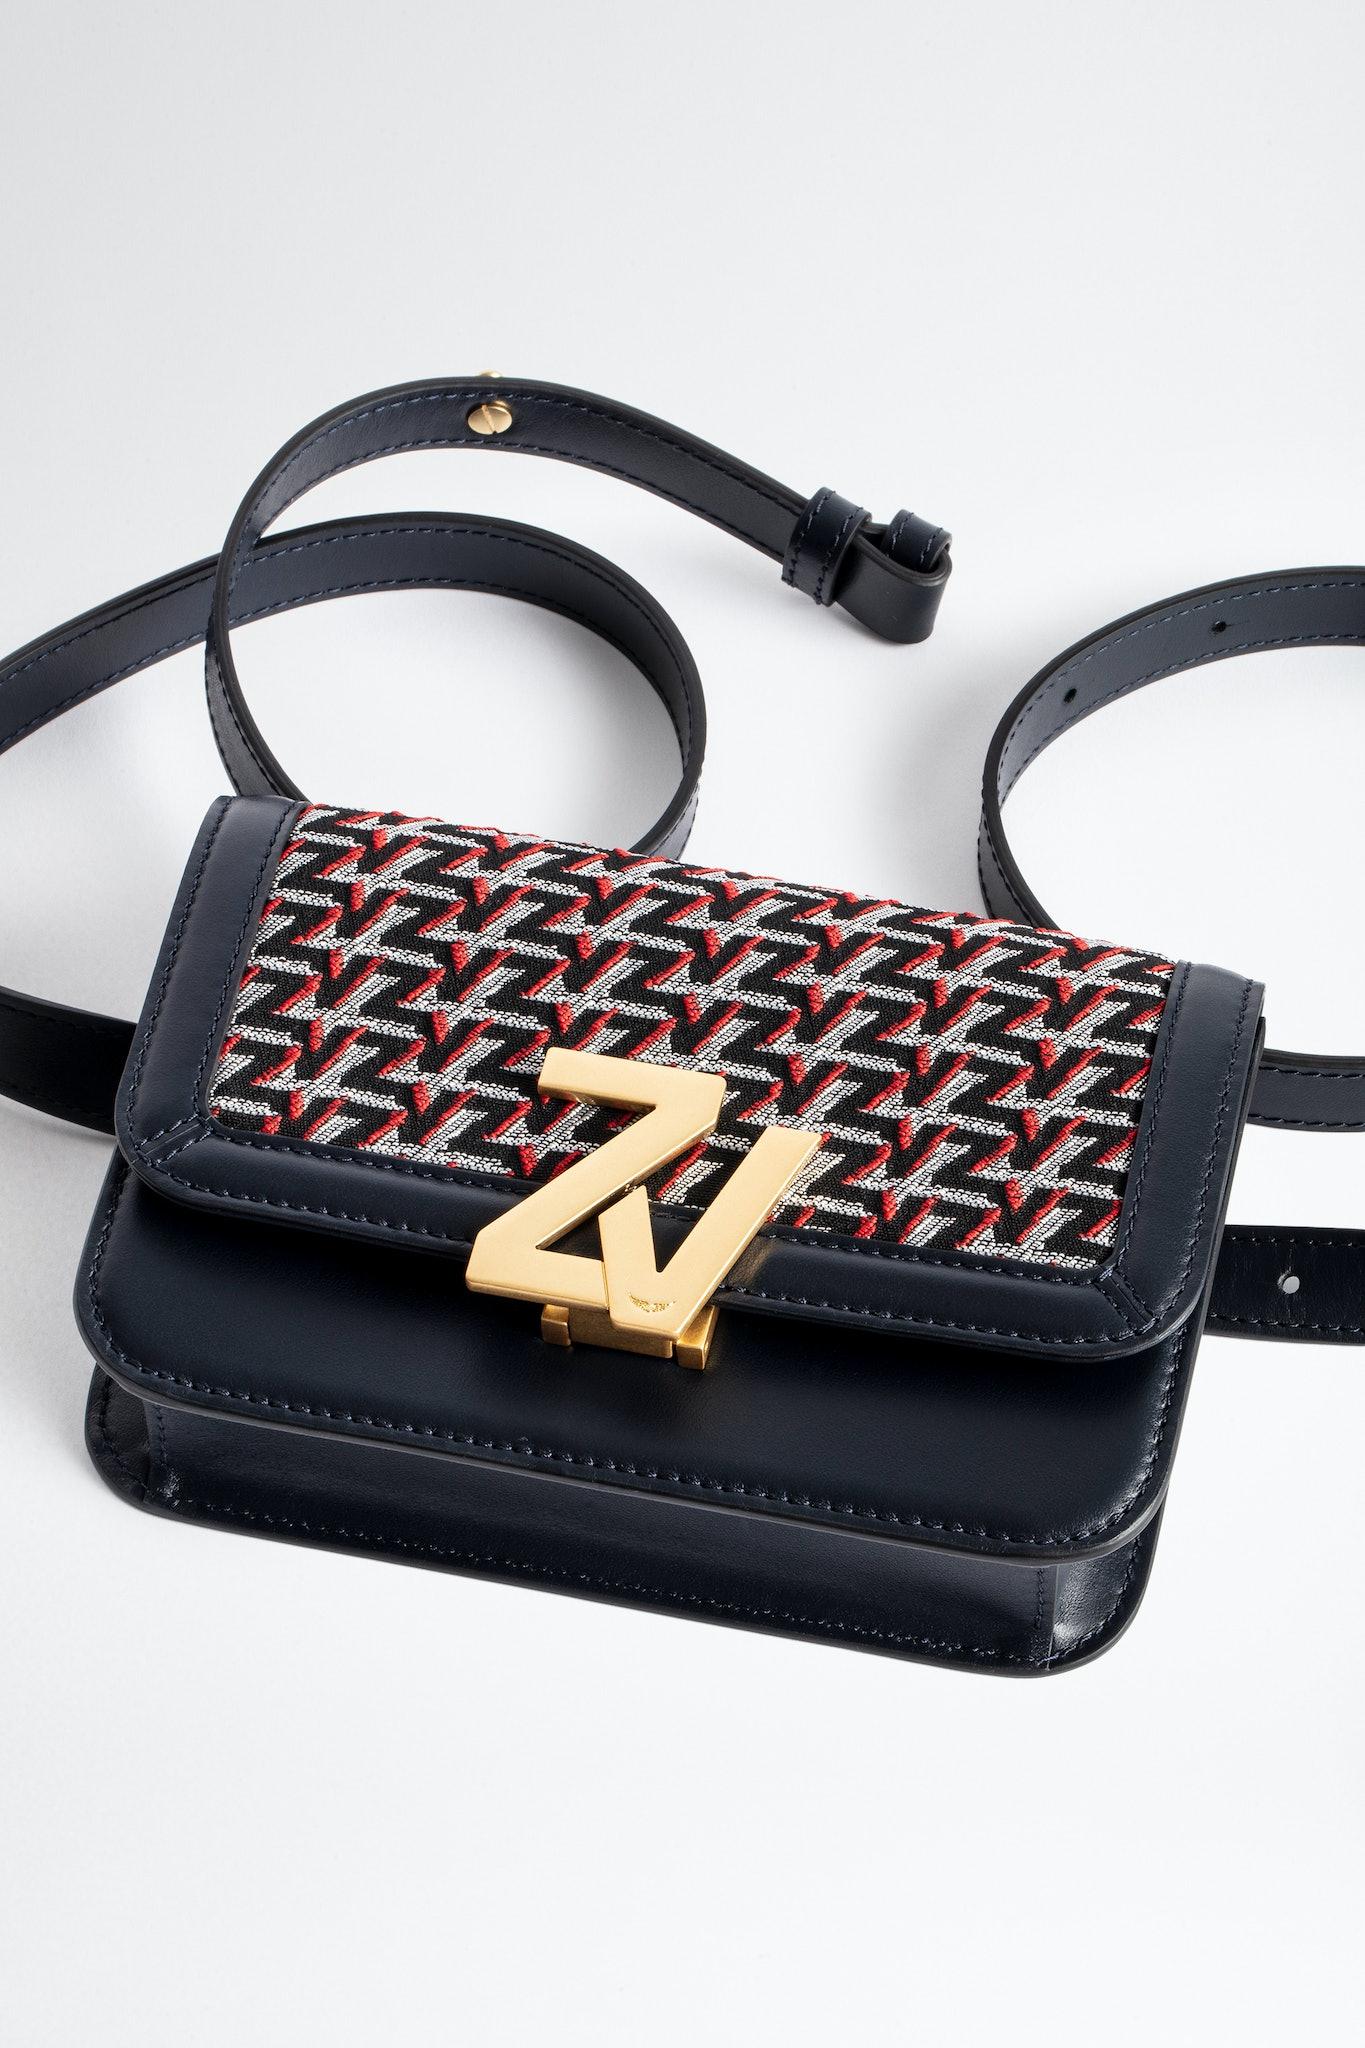 ZV Initiale le belt bag monogram